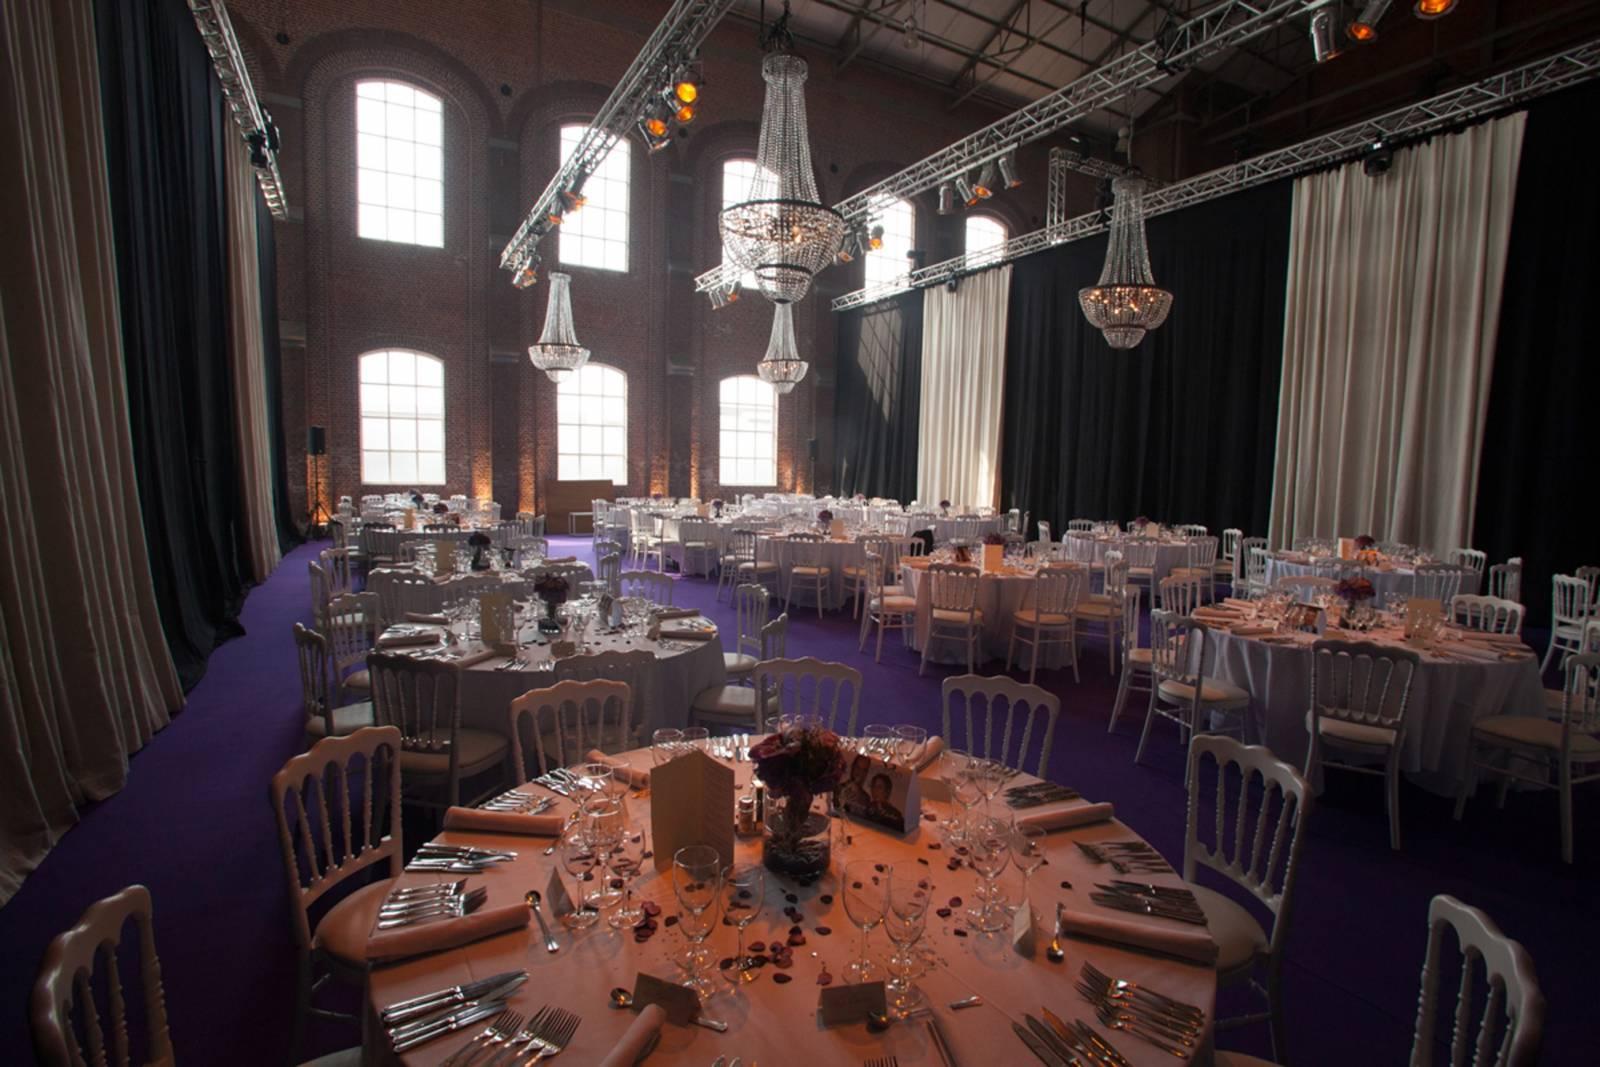 Hangar 43 - Feestzaal Oost-Vlaanderen - Industrieel - House of Weddings - 11